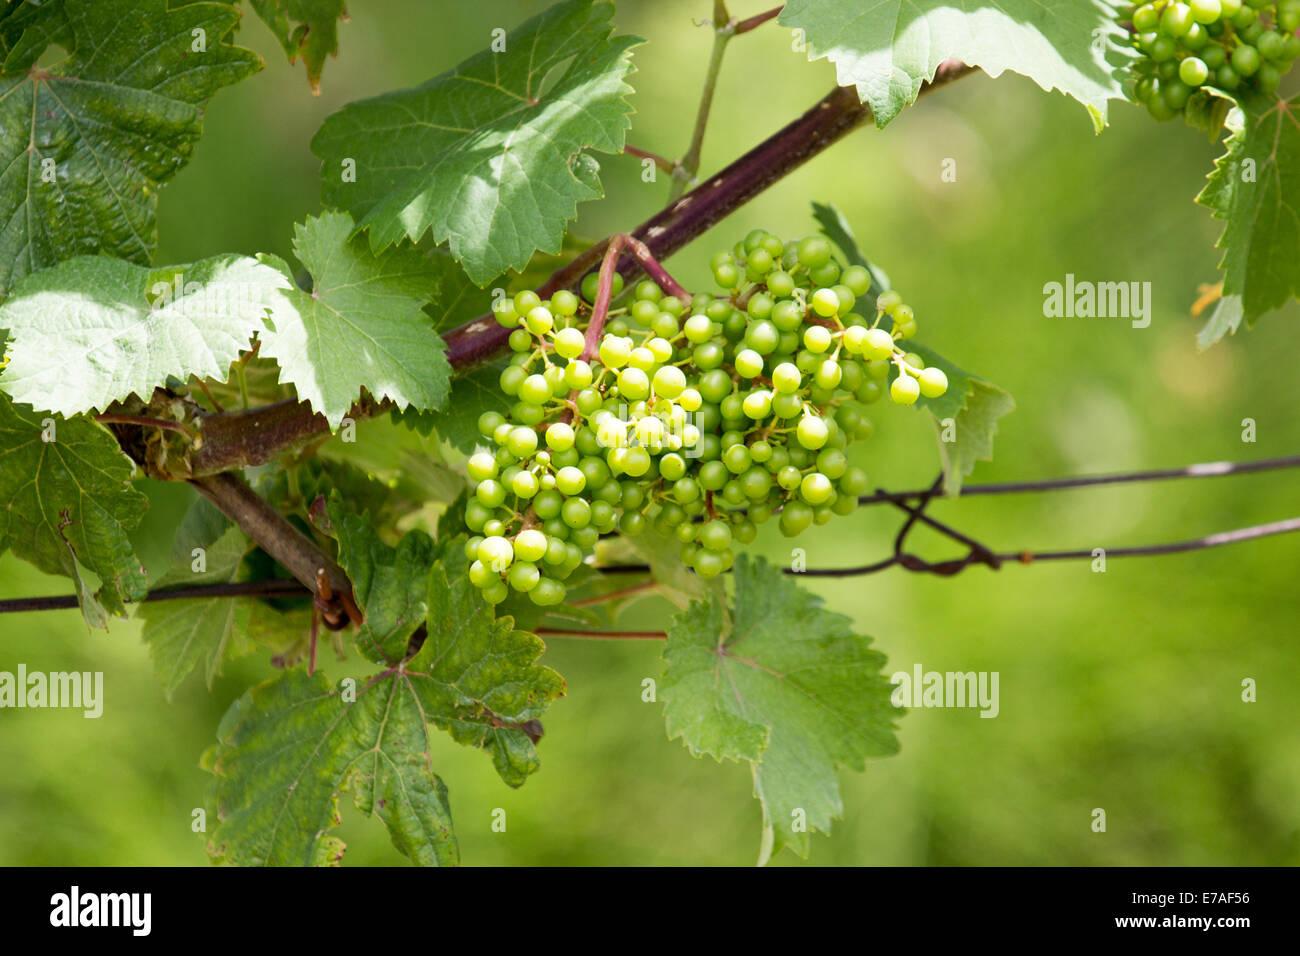 Green grapes on vine Stock Photo